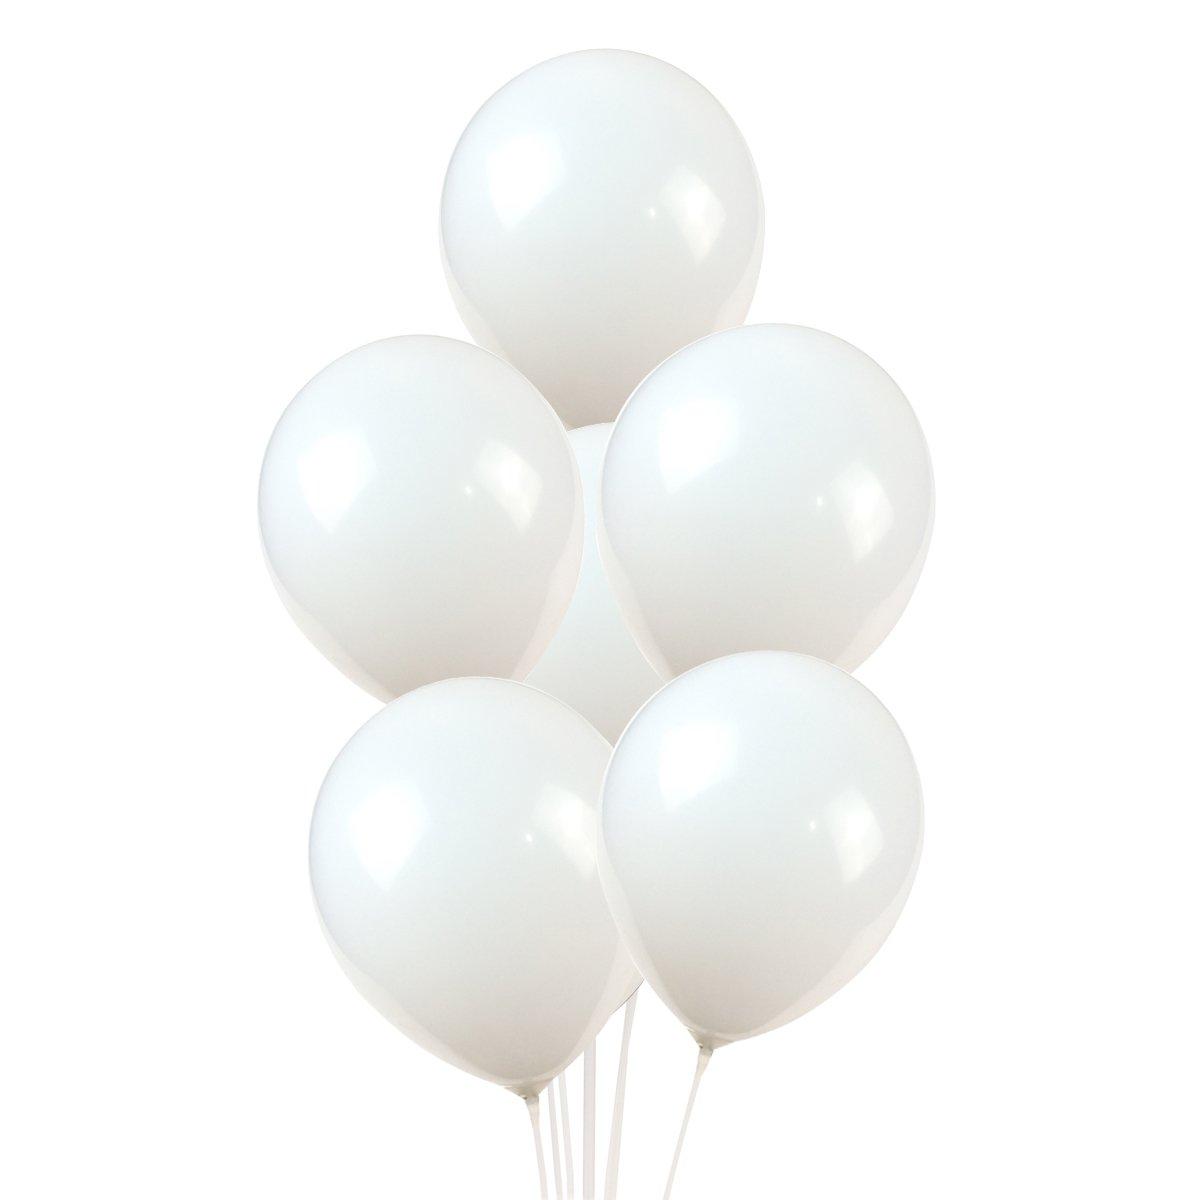 100 Premium Quality Balloons: 12 inch white latex balloons KADBANER